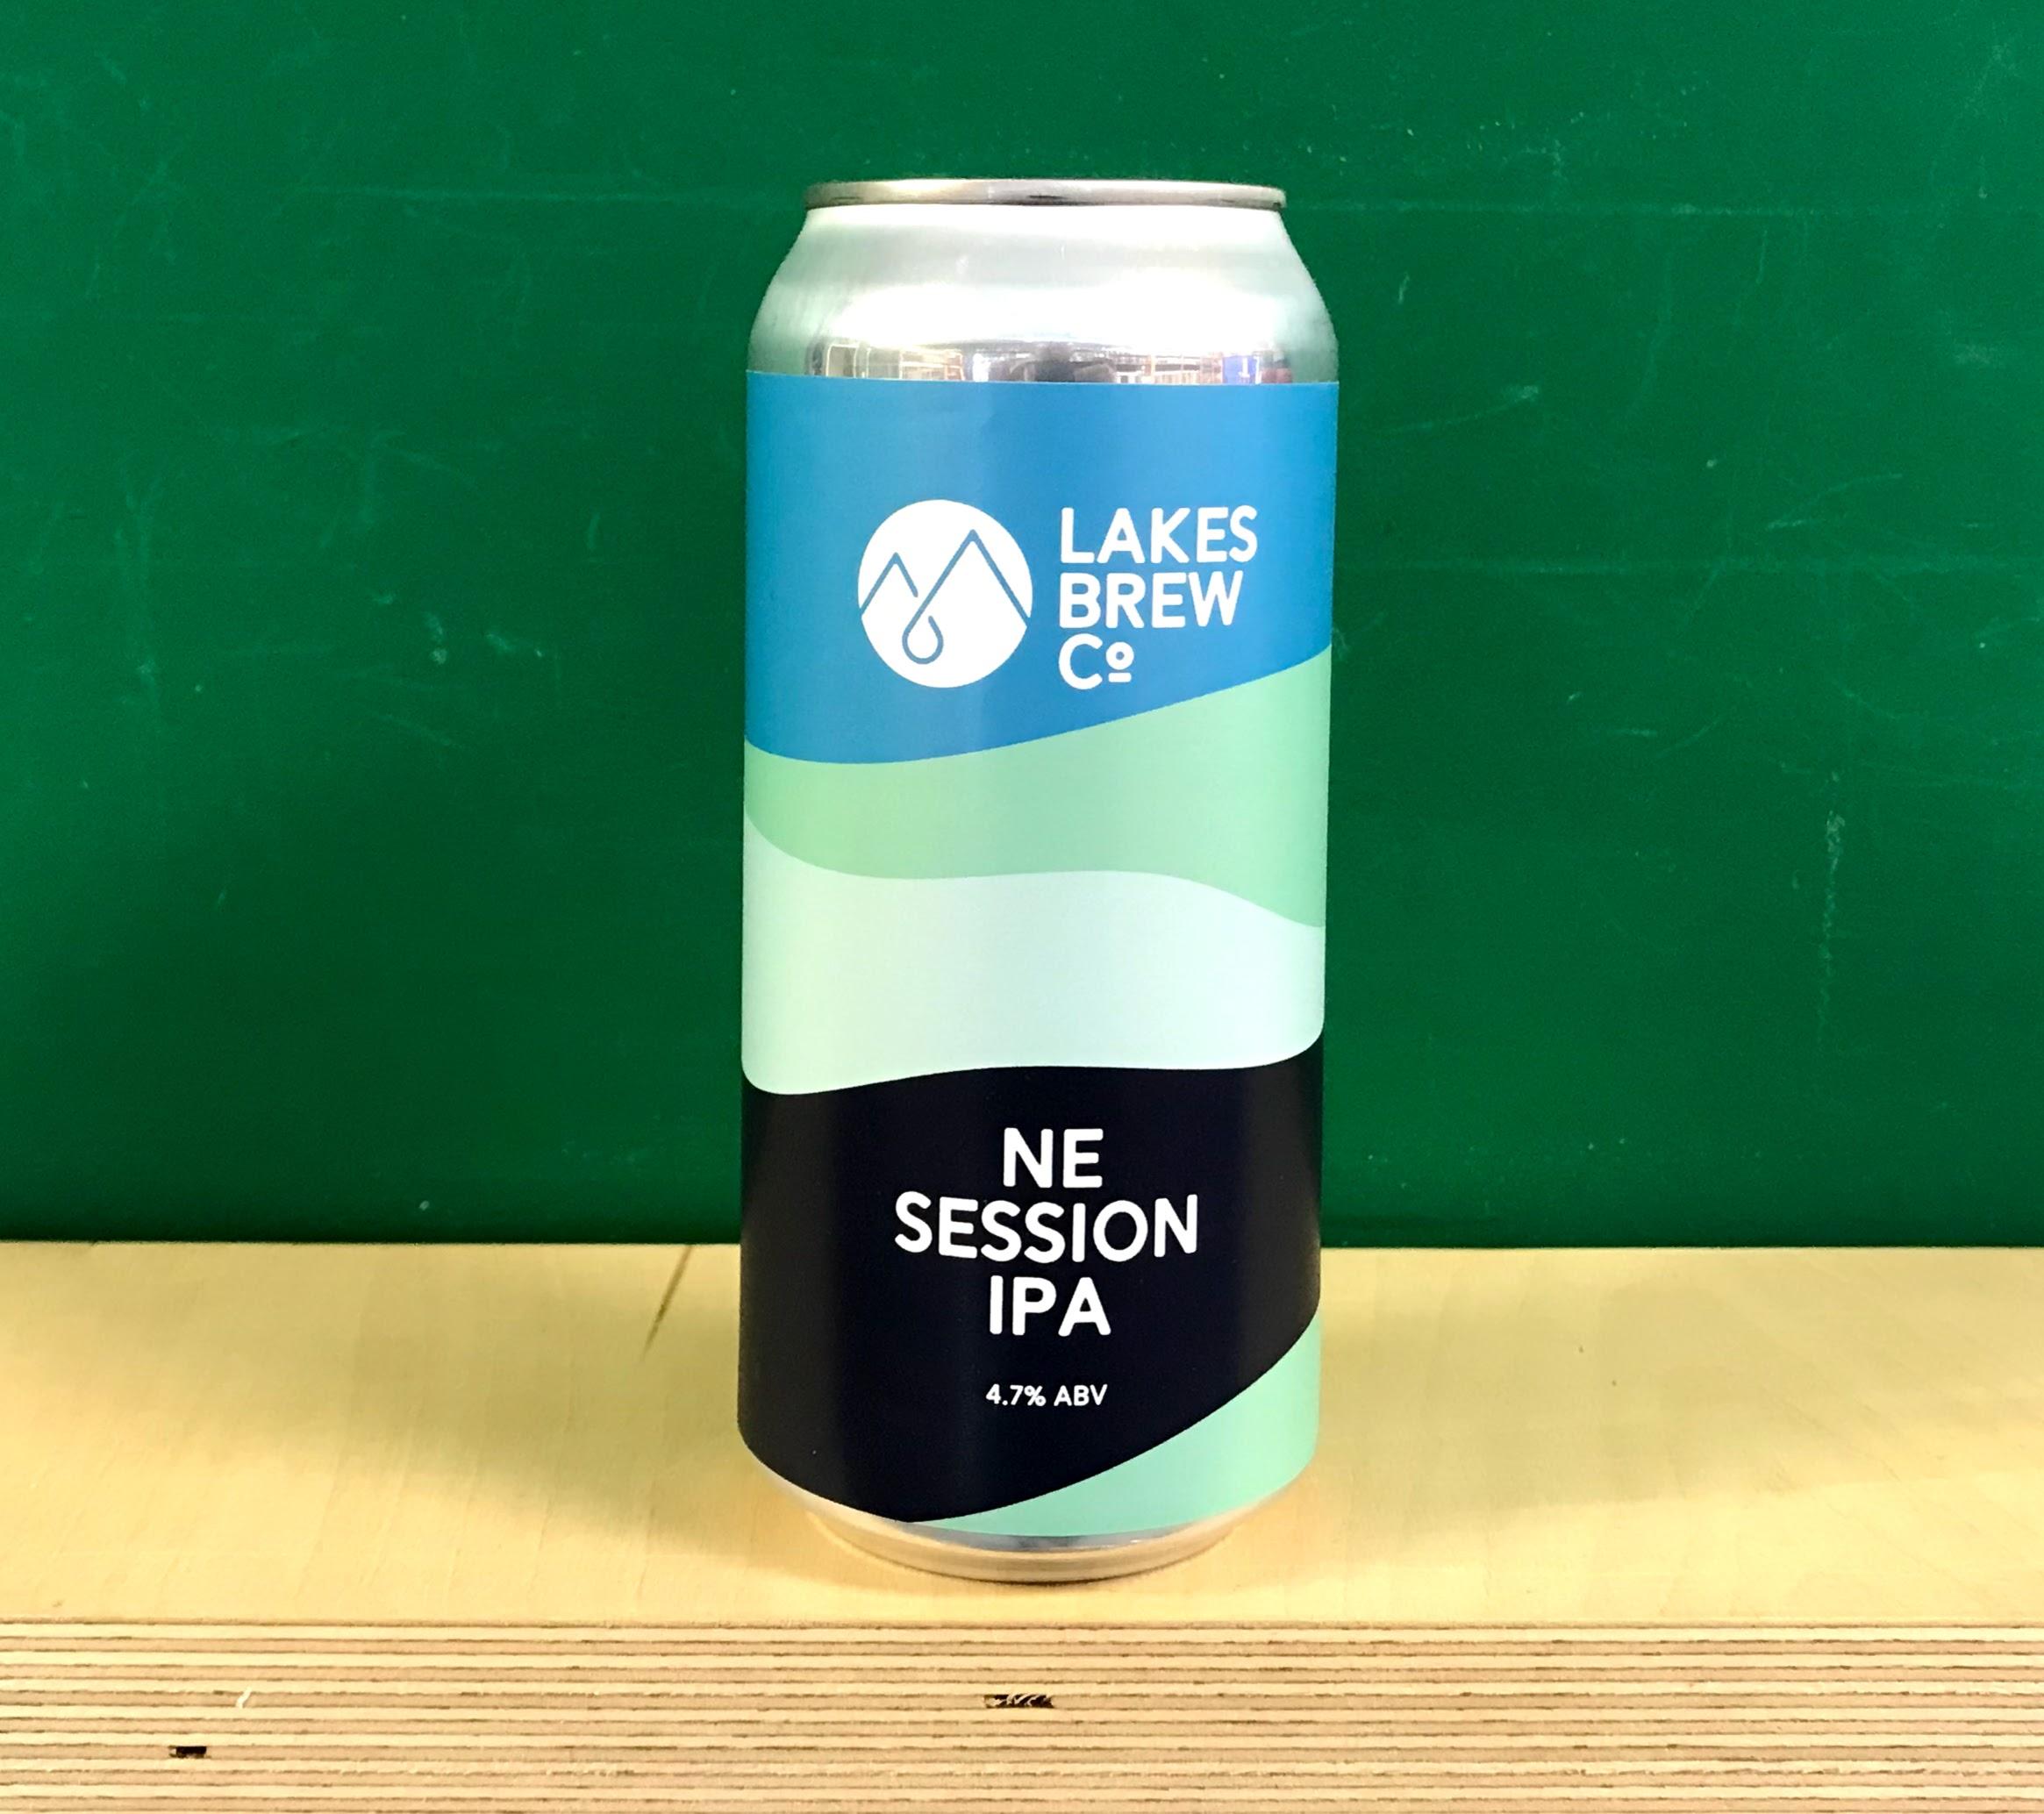 Lakes Brew Co NE Session IPA